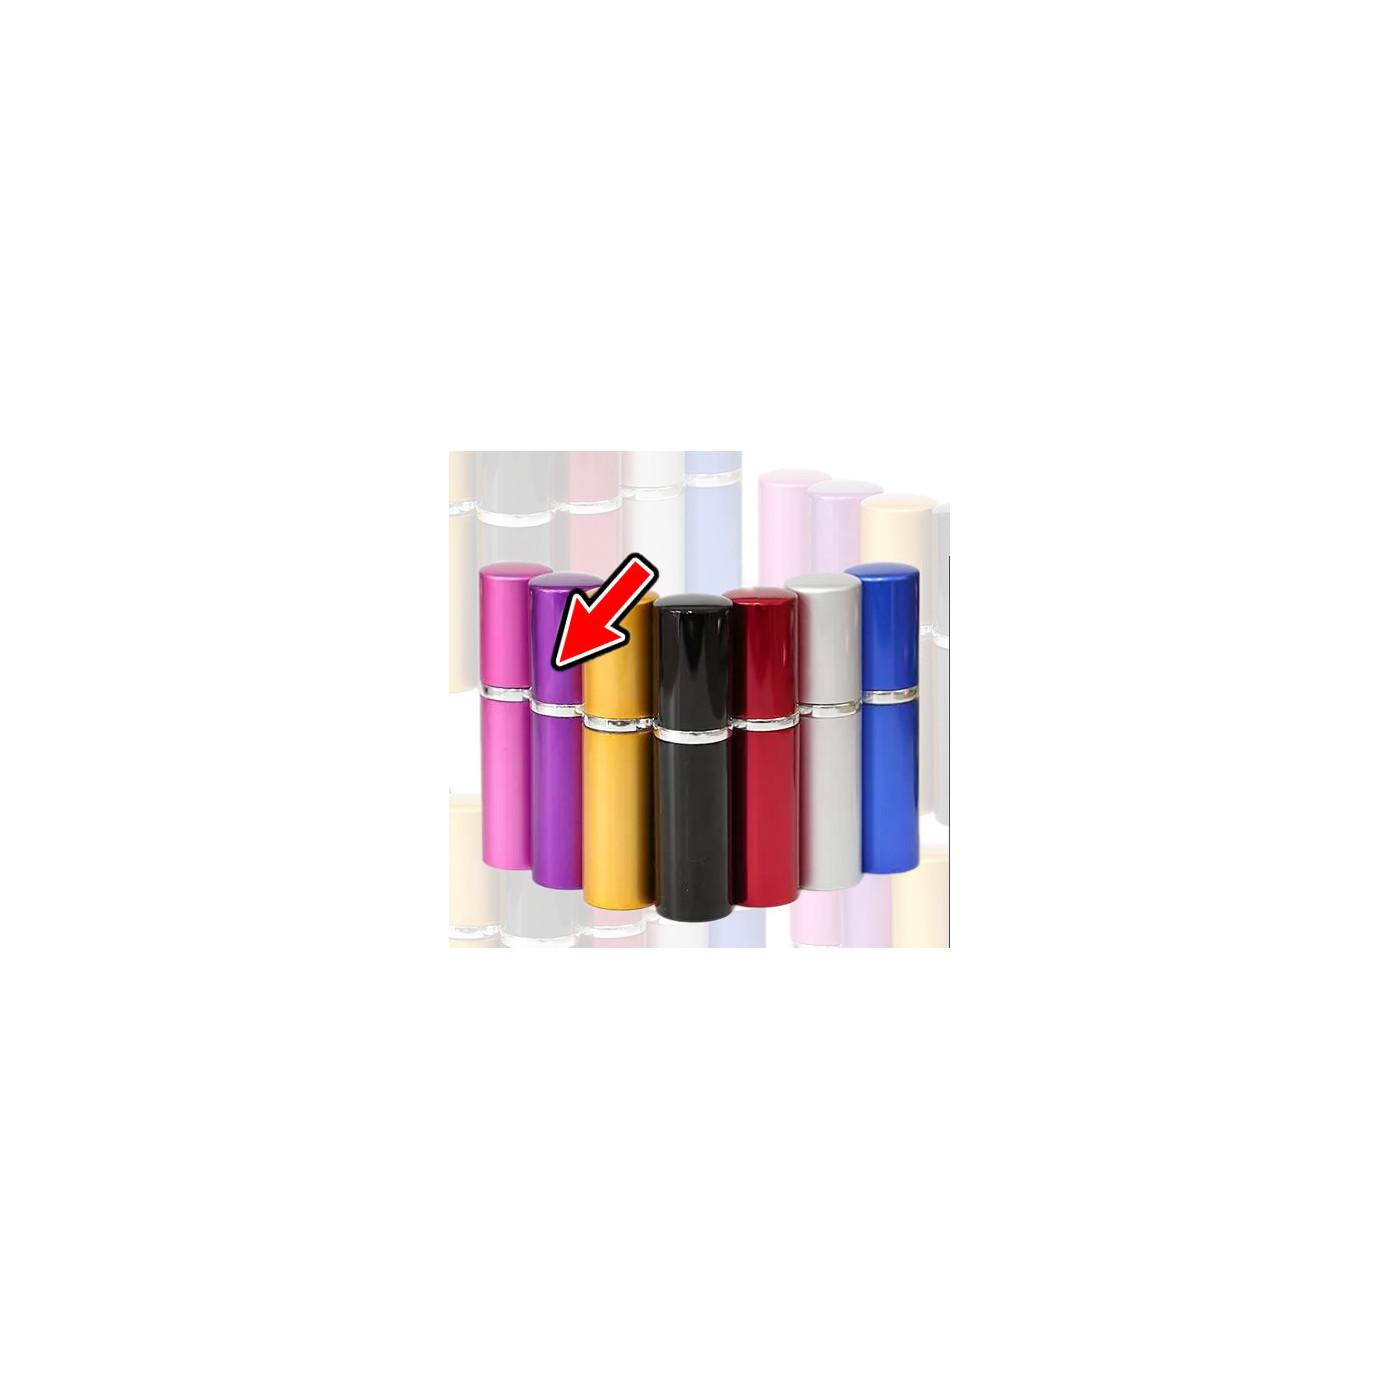 Set of 5 atomizers (10 ml, purple)